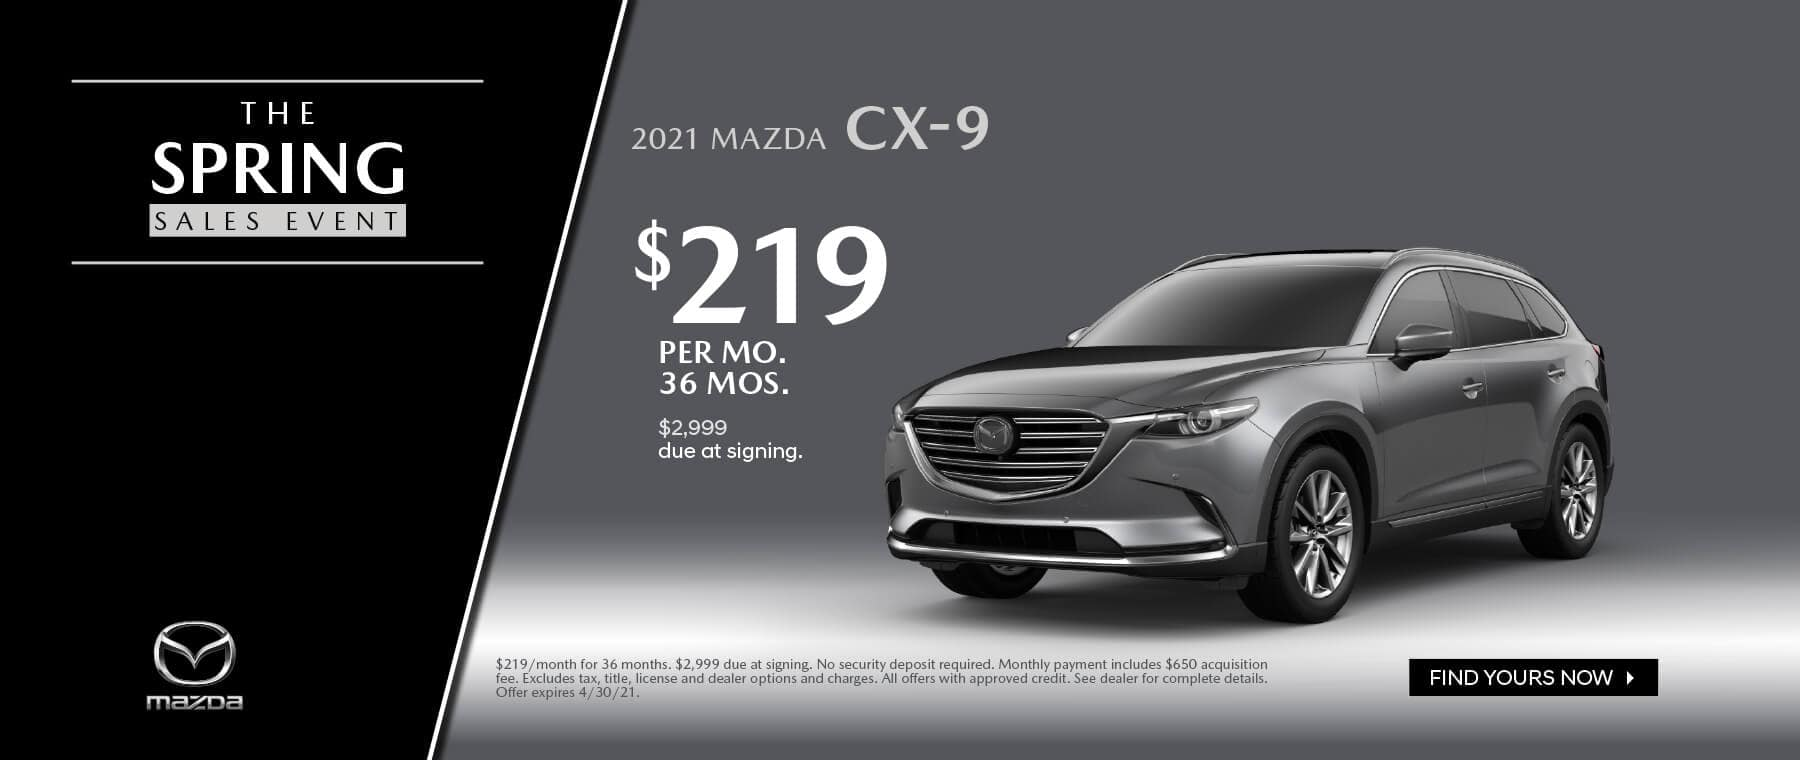 2021.03.26-Keffer-Mazda-APR-Web-Banners-S51614vw-4